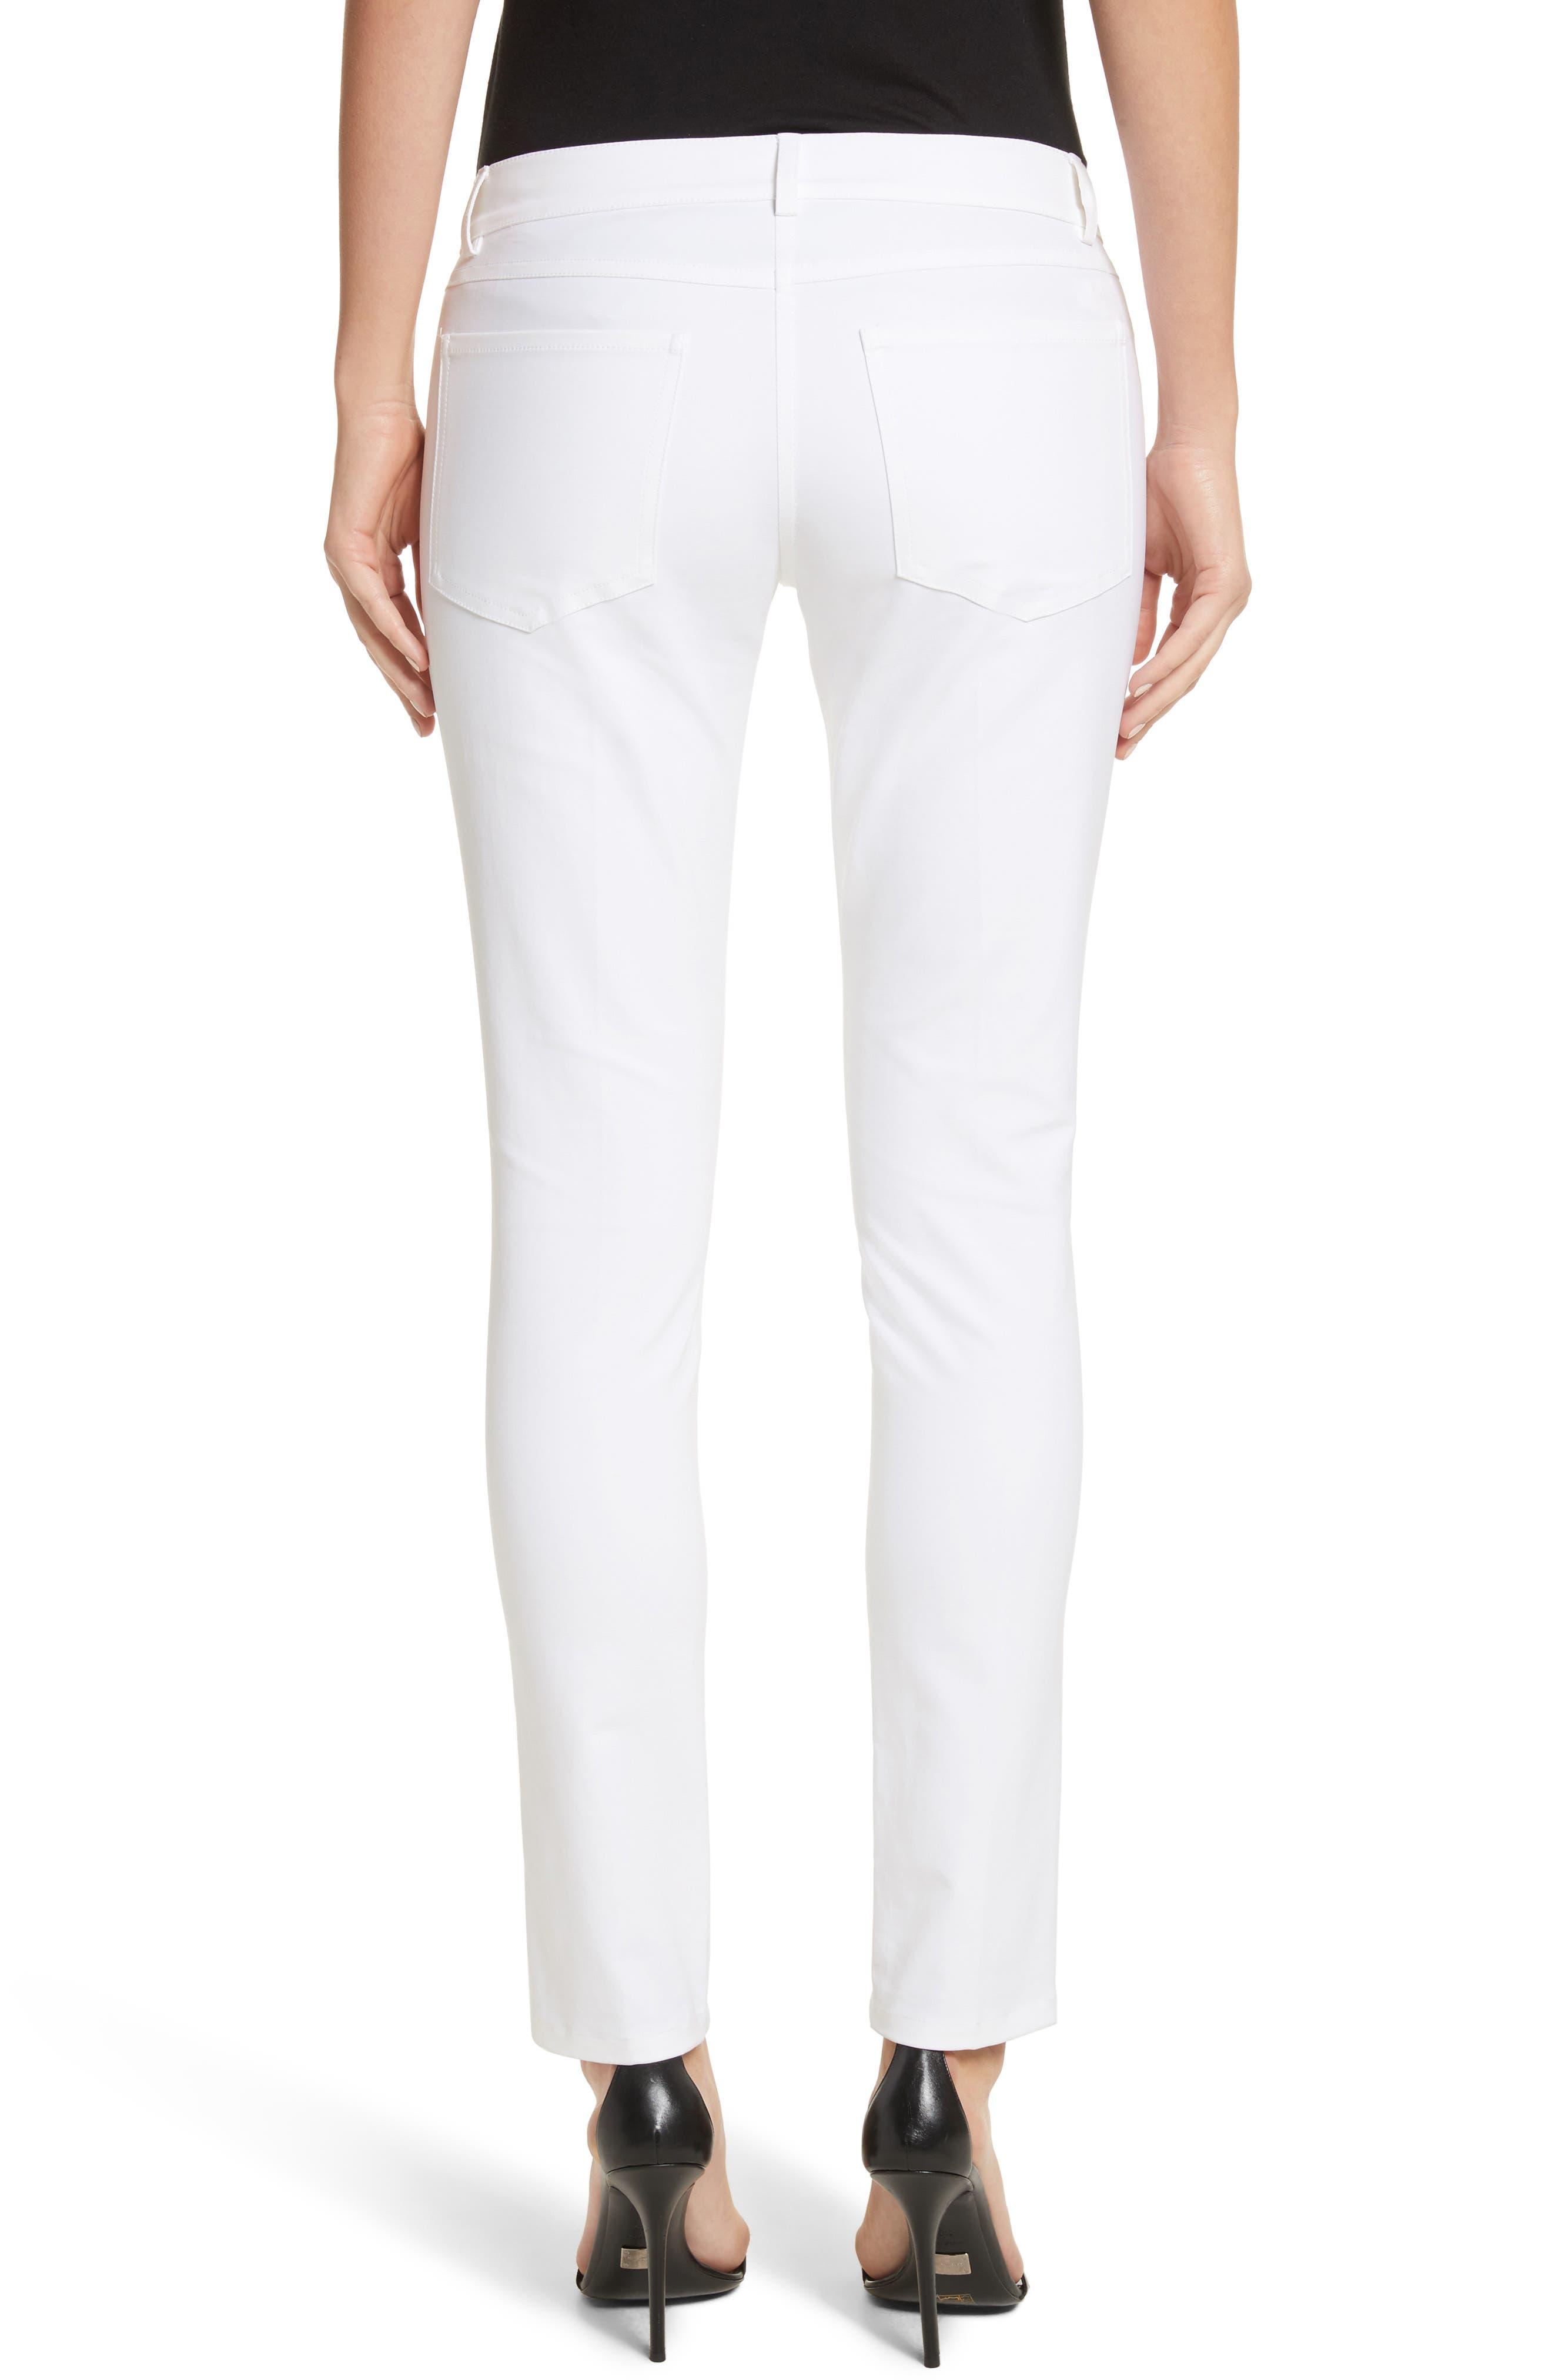 Alternate Image 2  - Michael Kors Samantha Skinny Jeans (Optic White)